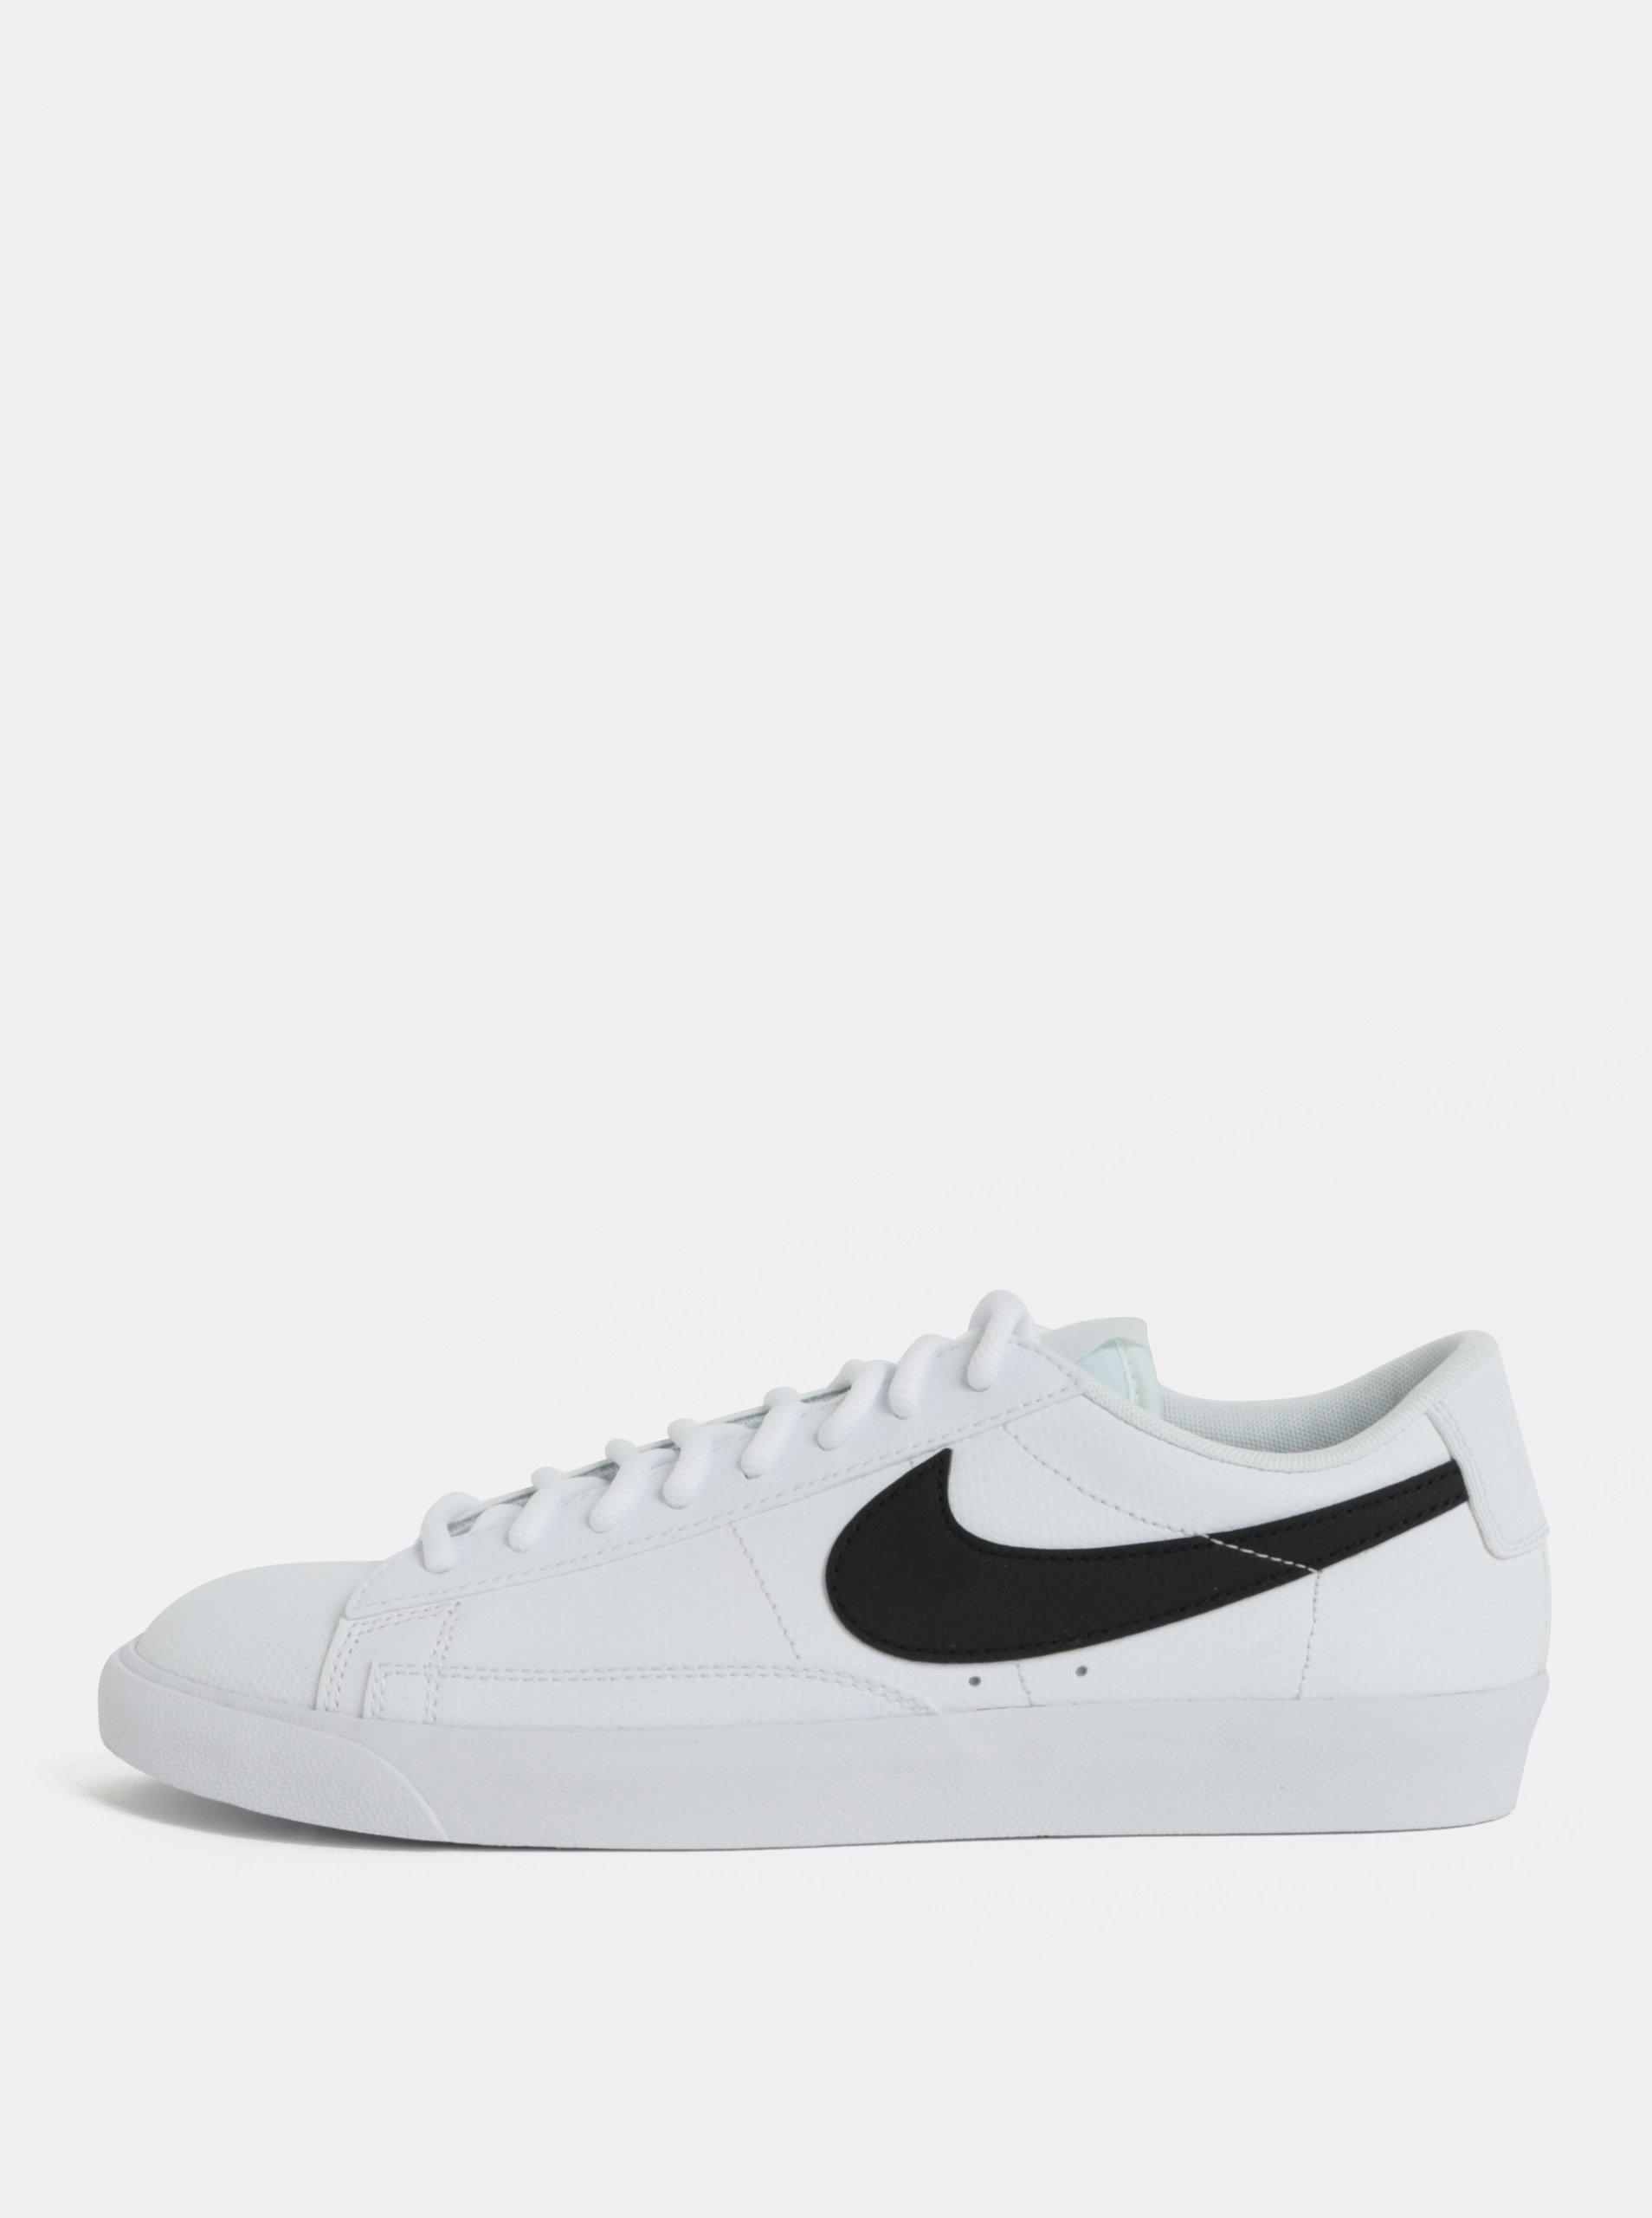 d0533b87528cd Biele pánske kožené tenisky Nike Blazer Low